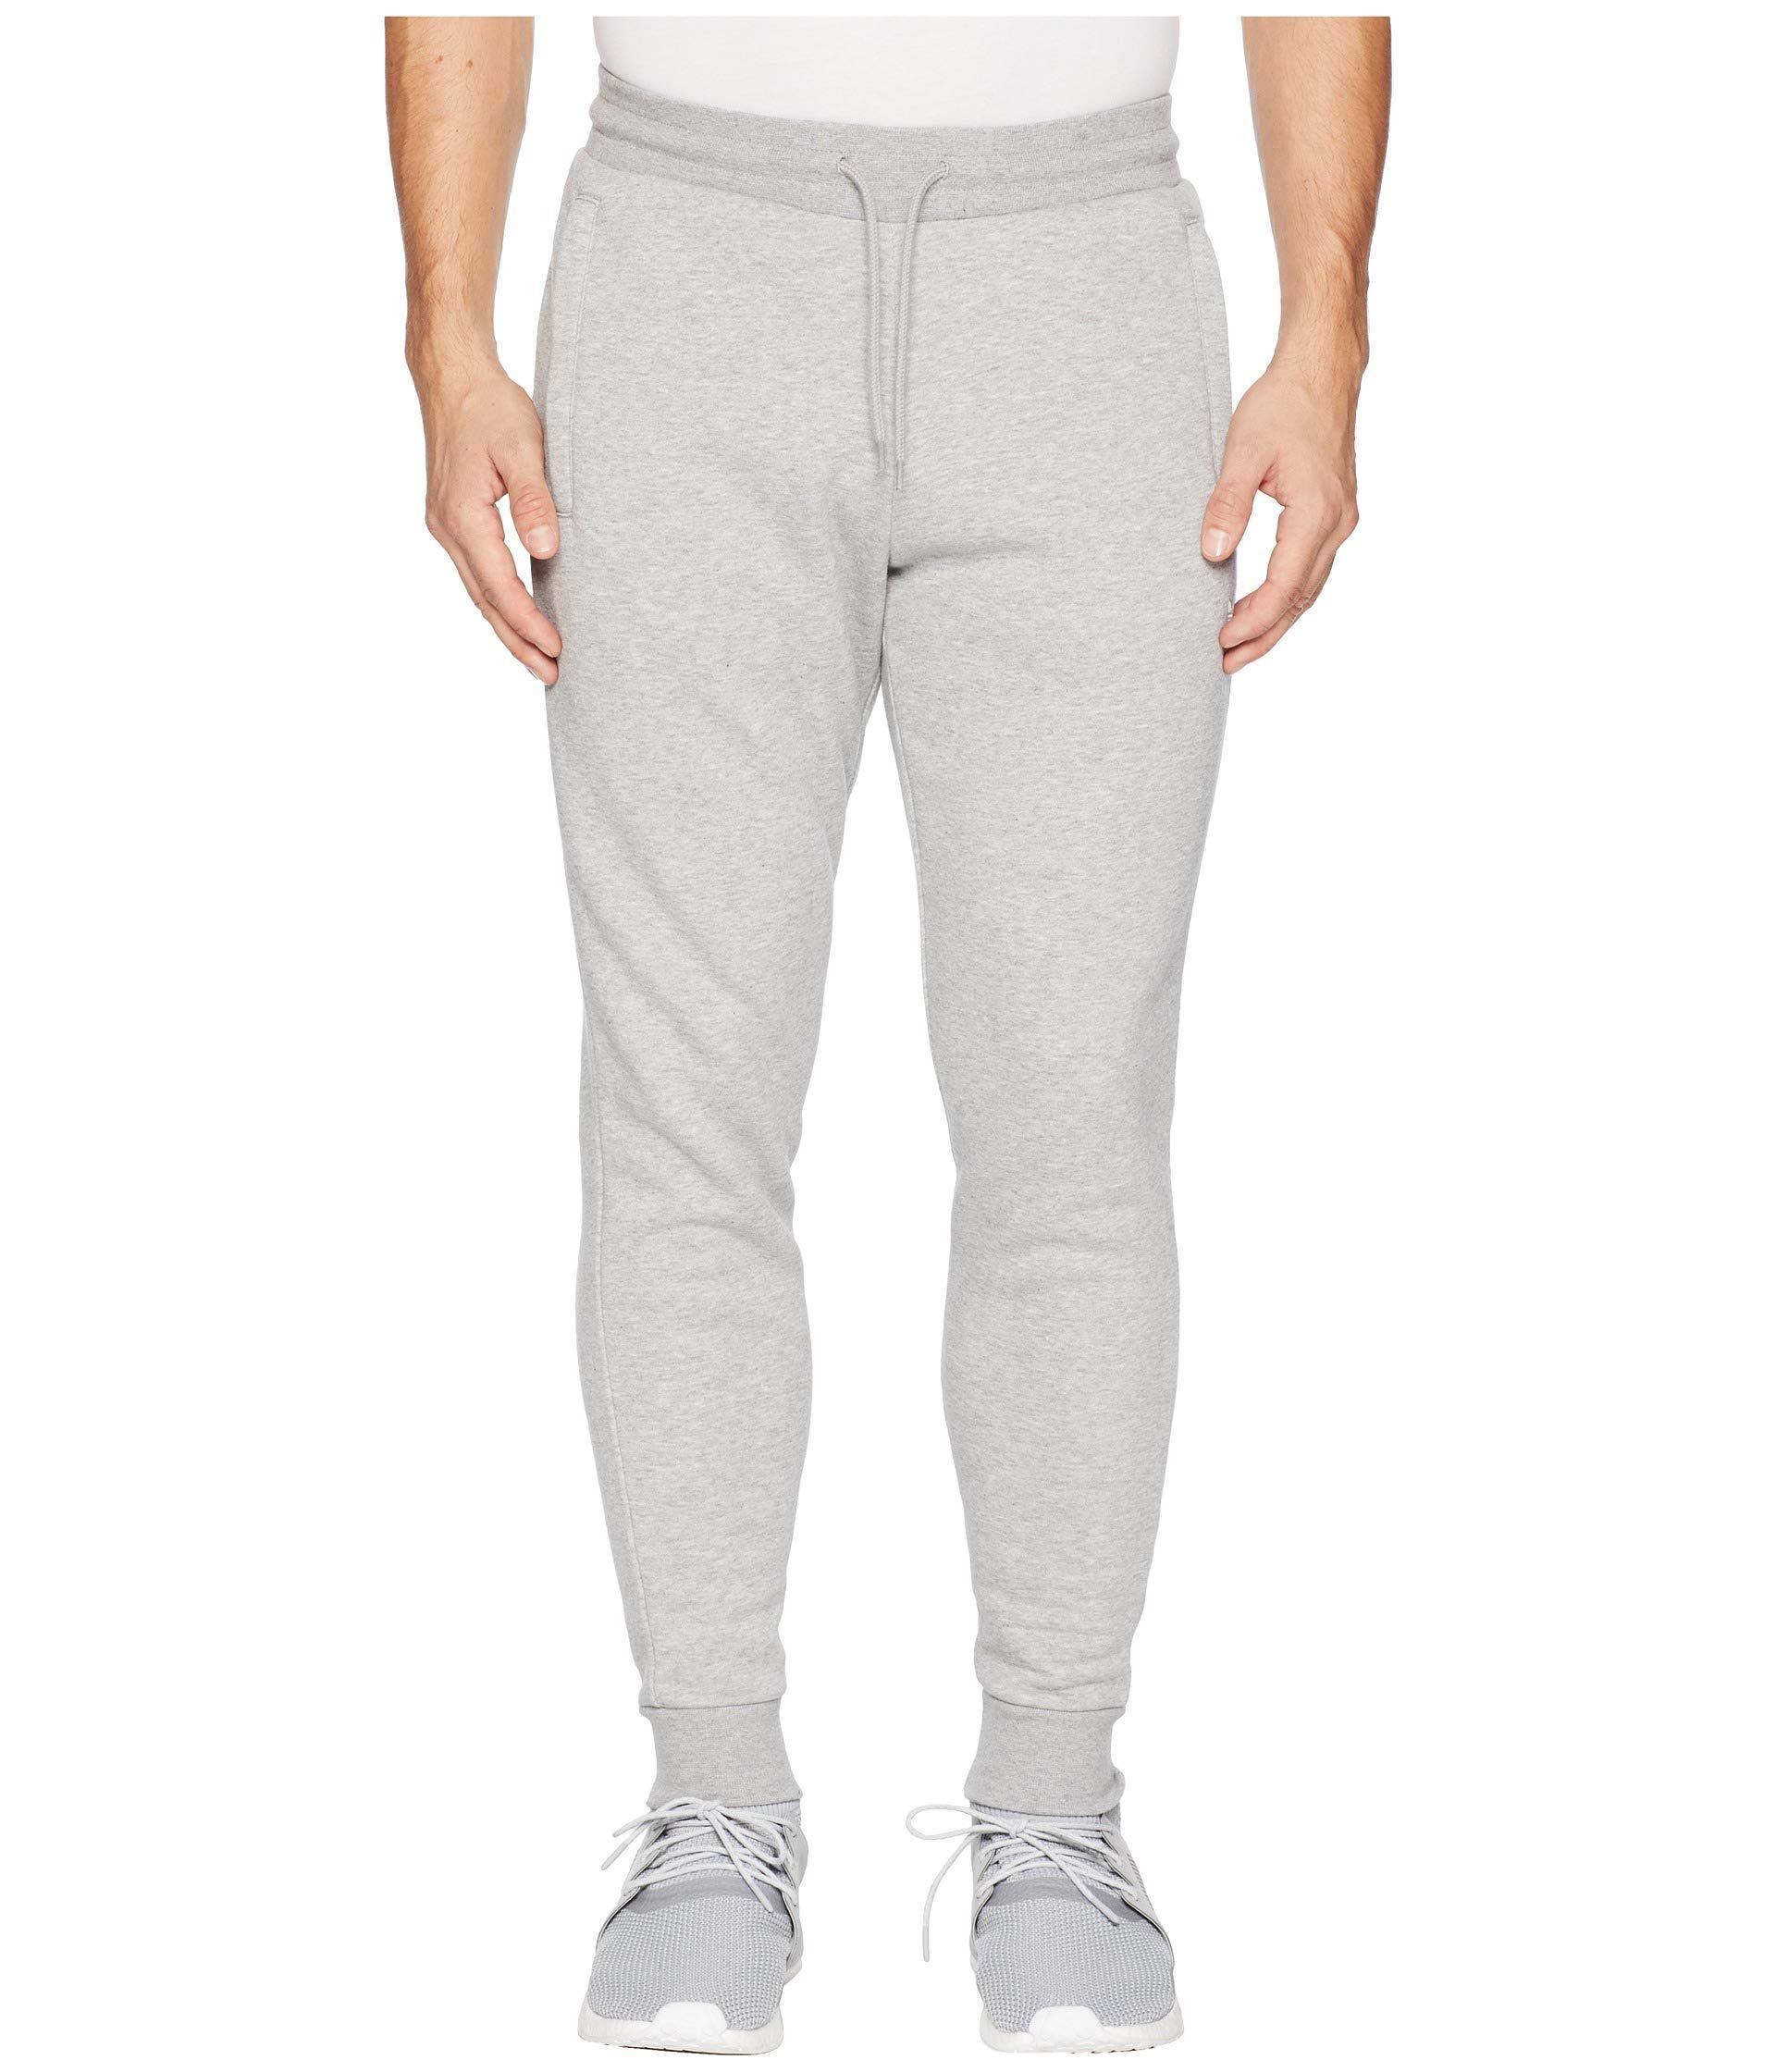 81458eeb0ea Lyst - Adidas Originals Slim Fleece Pants in Gray for Men